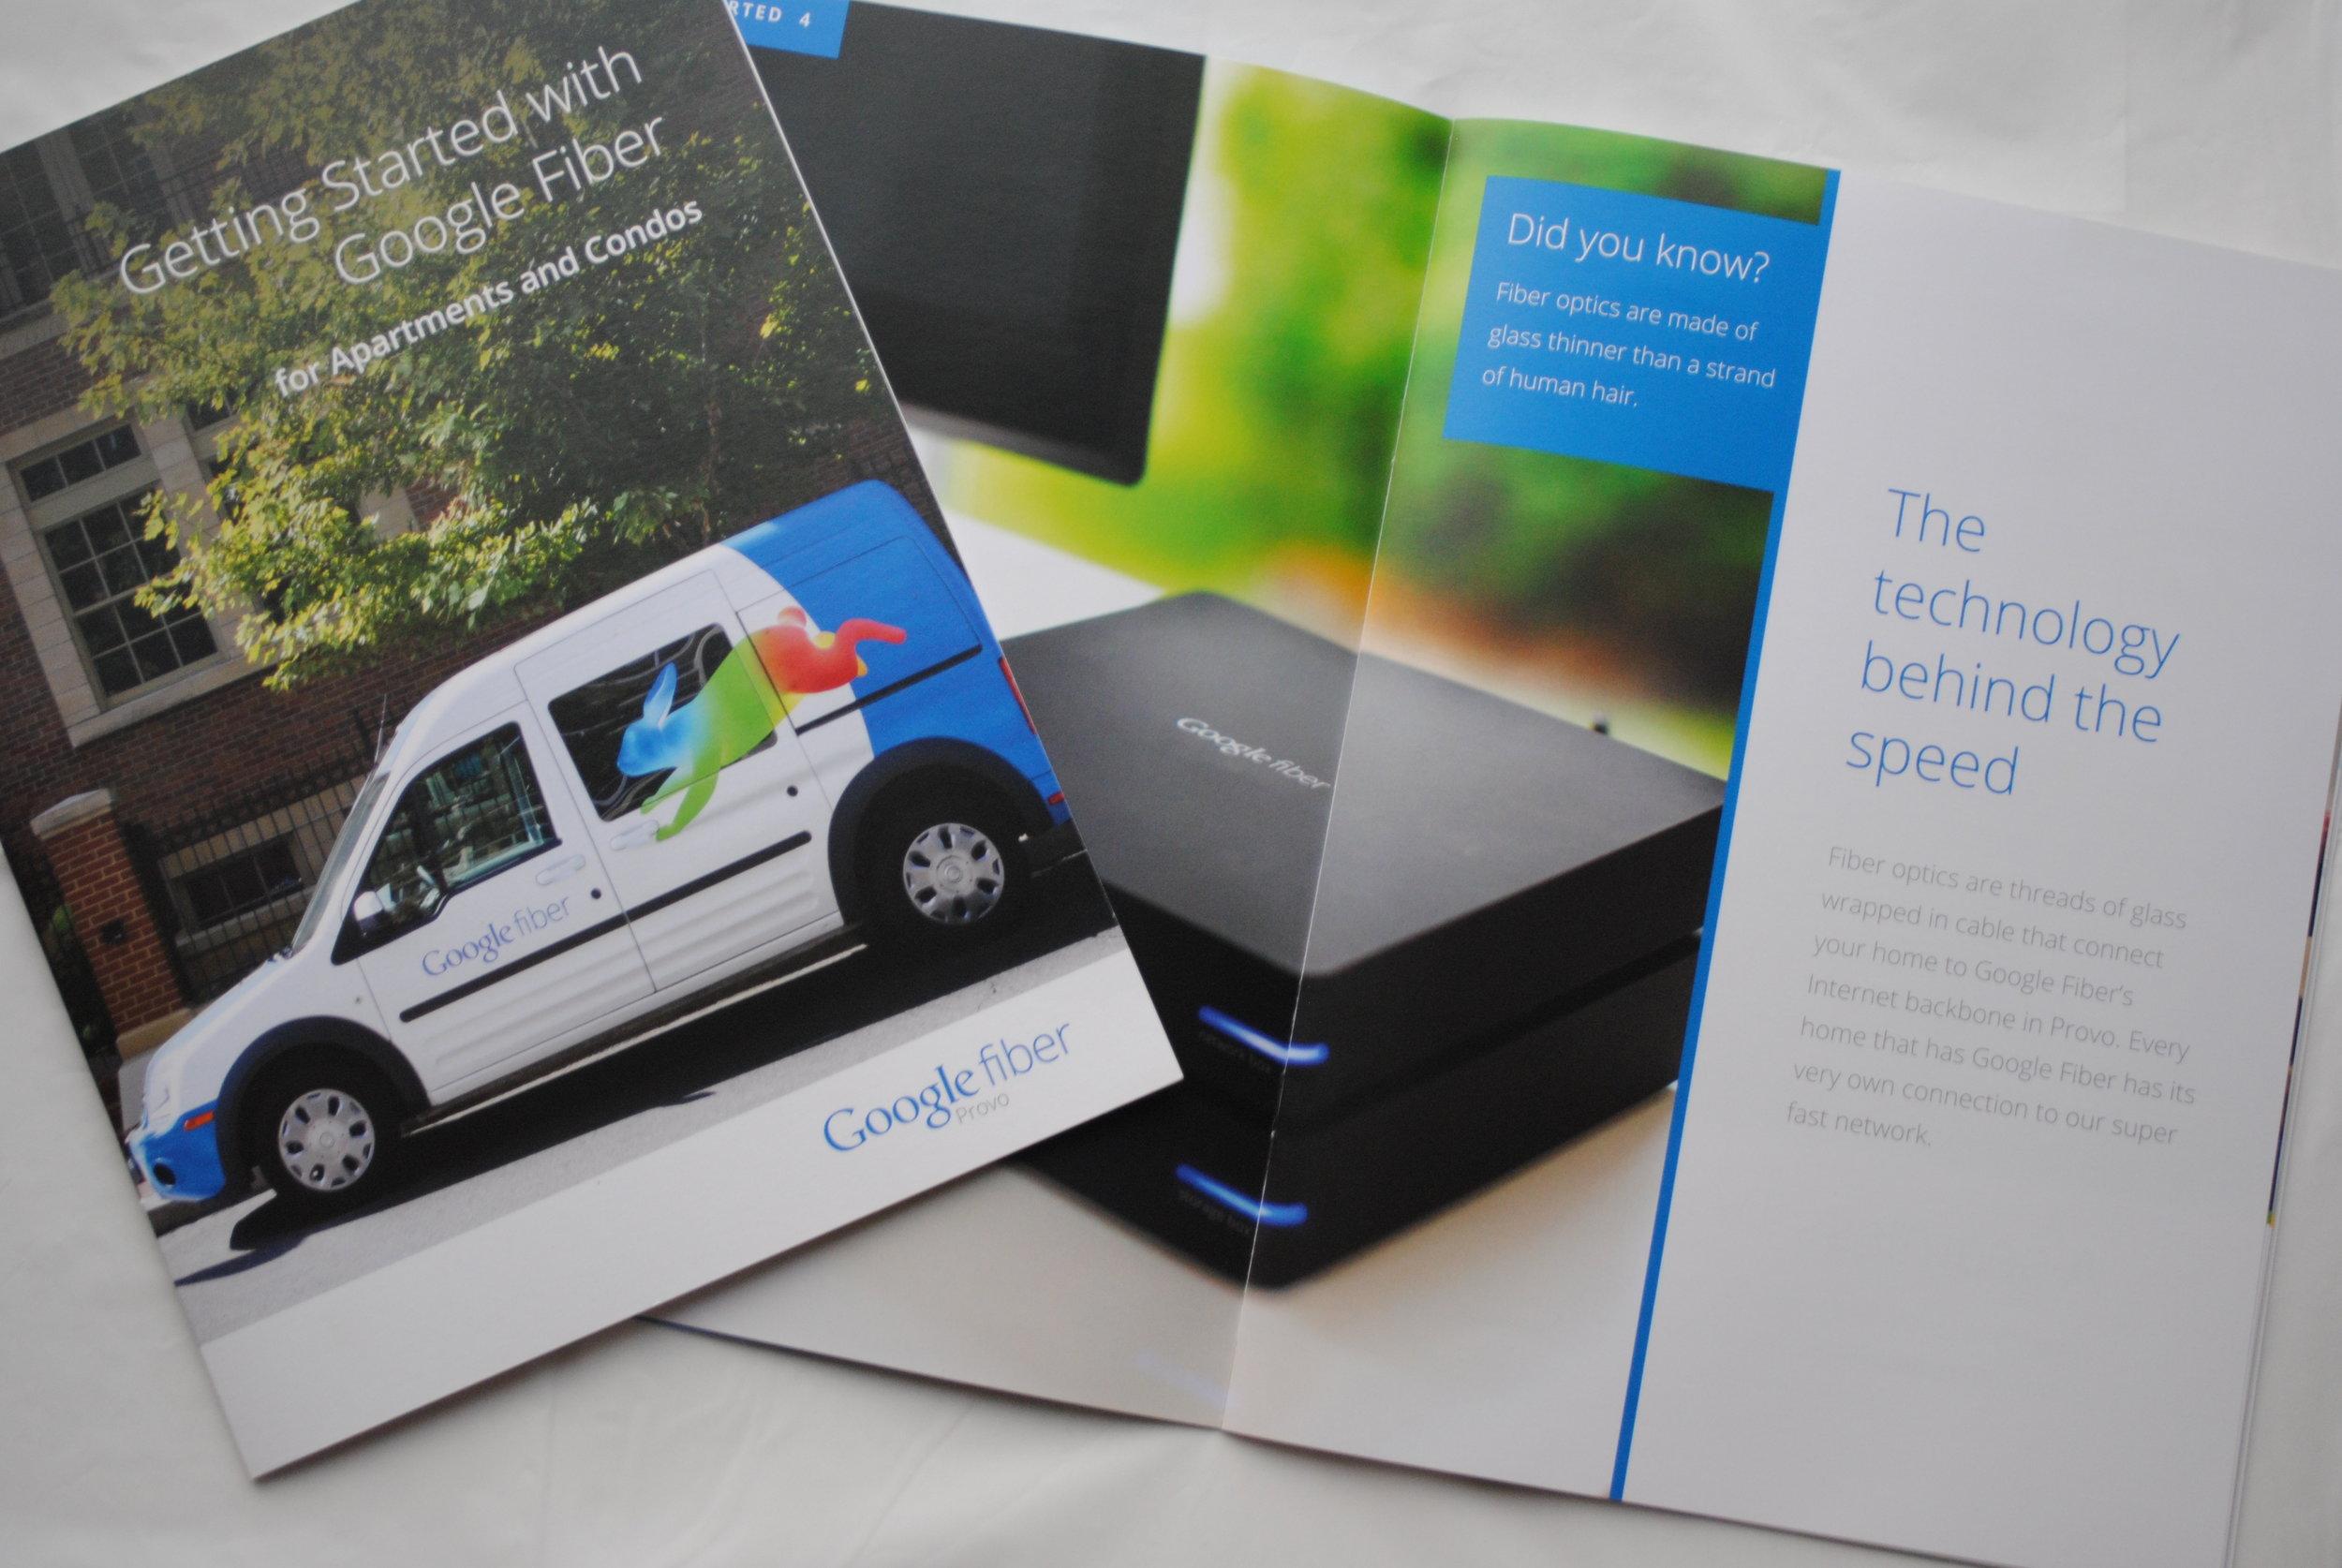 googlefiber-brochure1.JPG